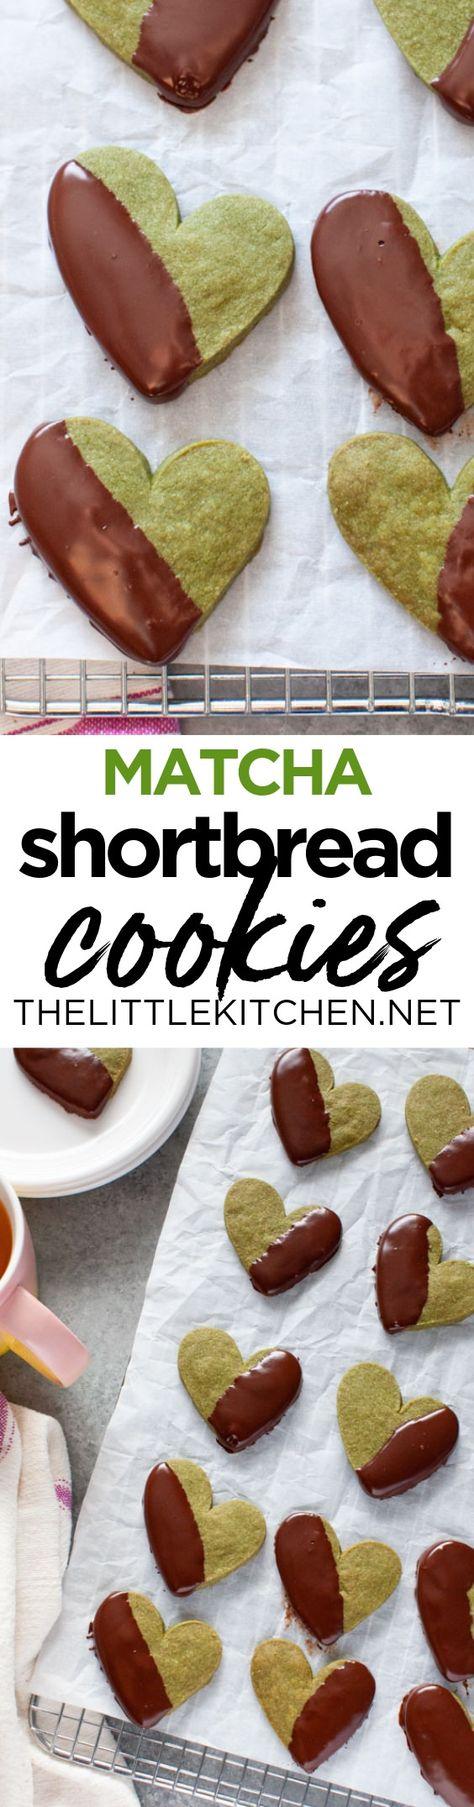 (AD) Make these wonderful matcha shortbread cookies with #NielsenMassey Madagascar Bourbon Pure Vanilla Extract! (sponsored pin) #BetterYourBake #matcharecipe #shortbreadcookies